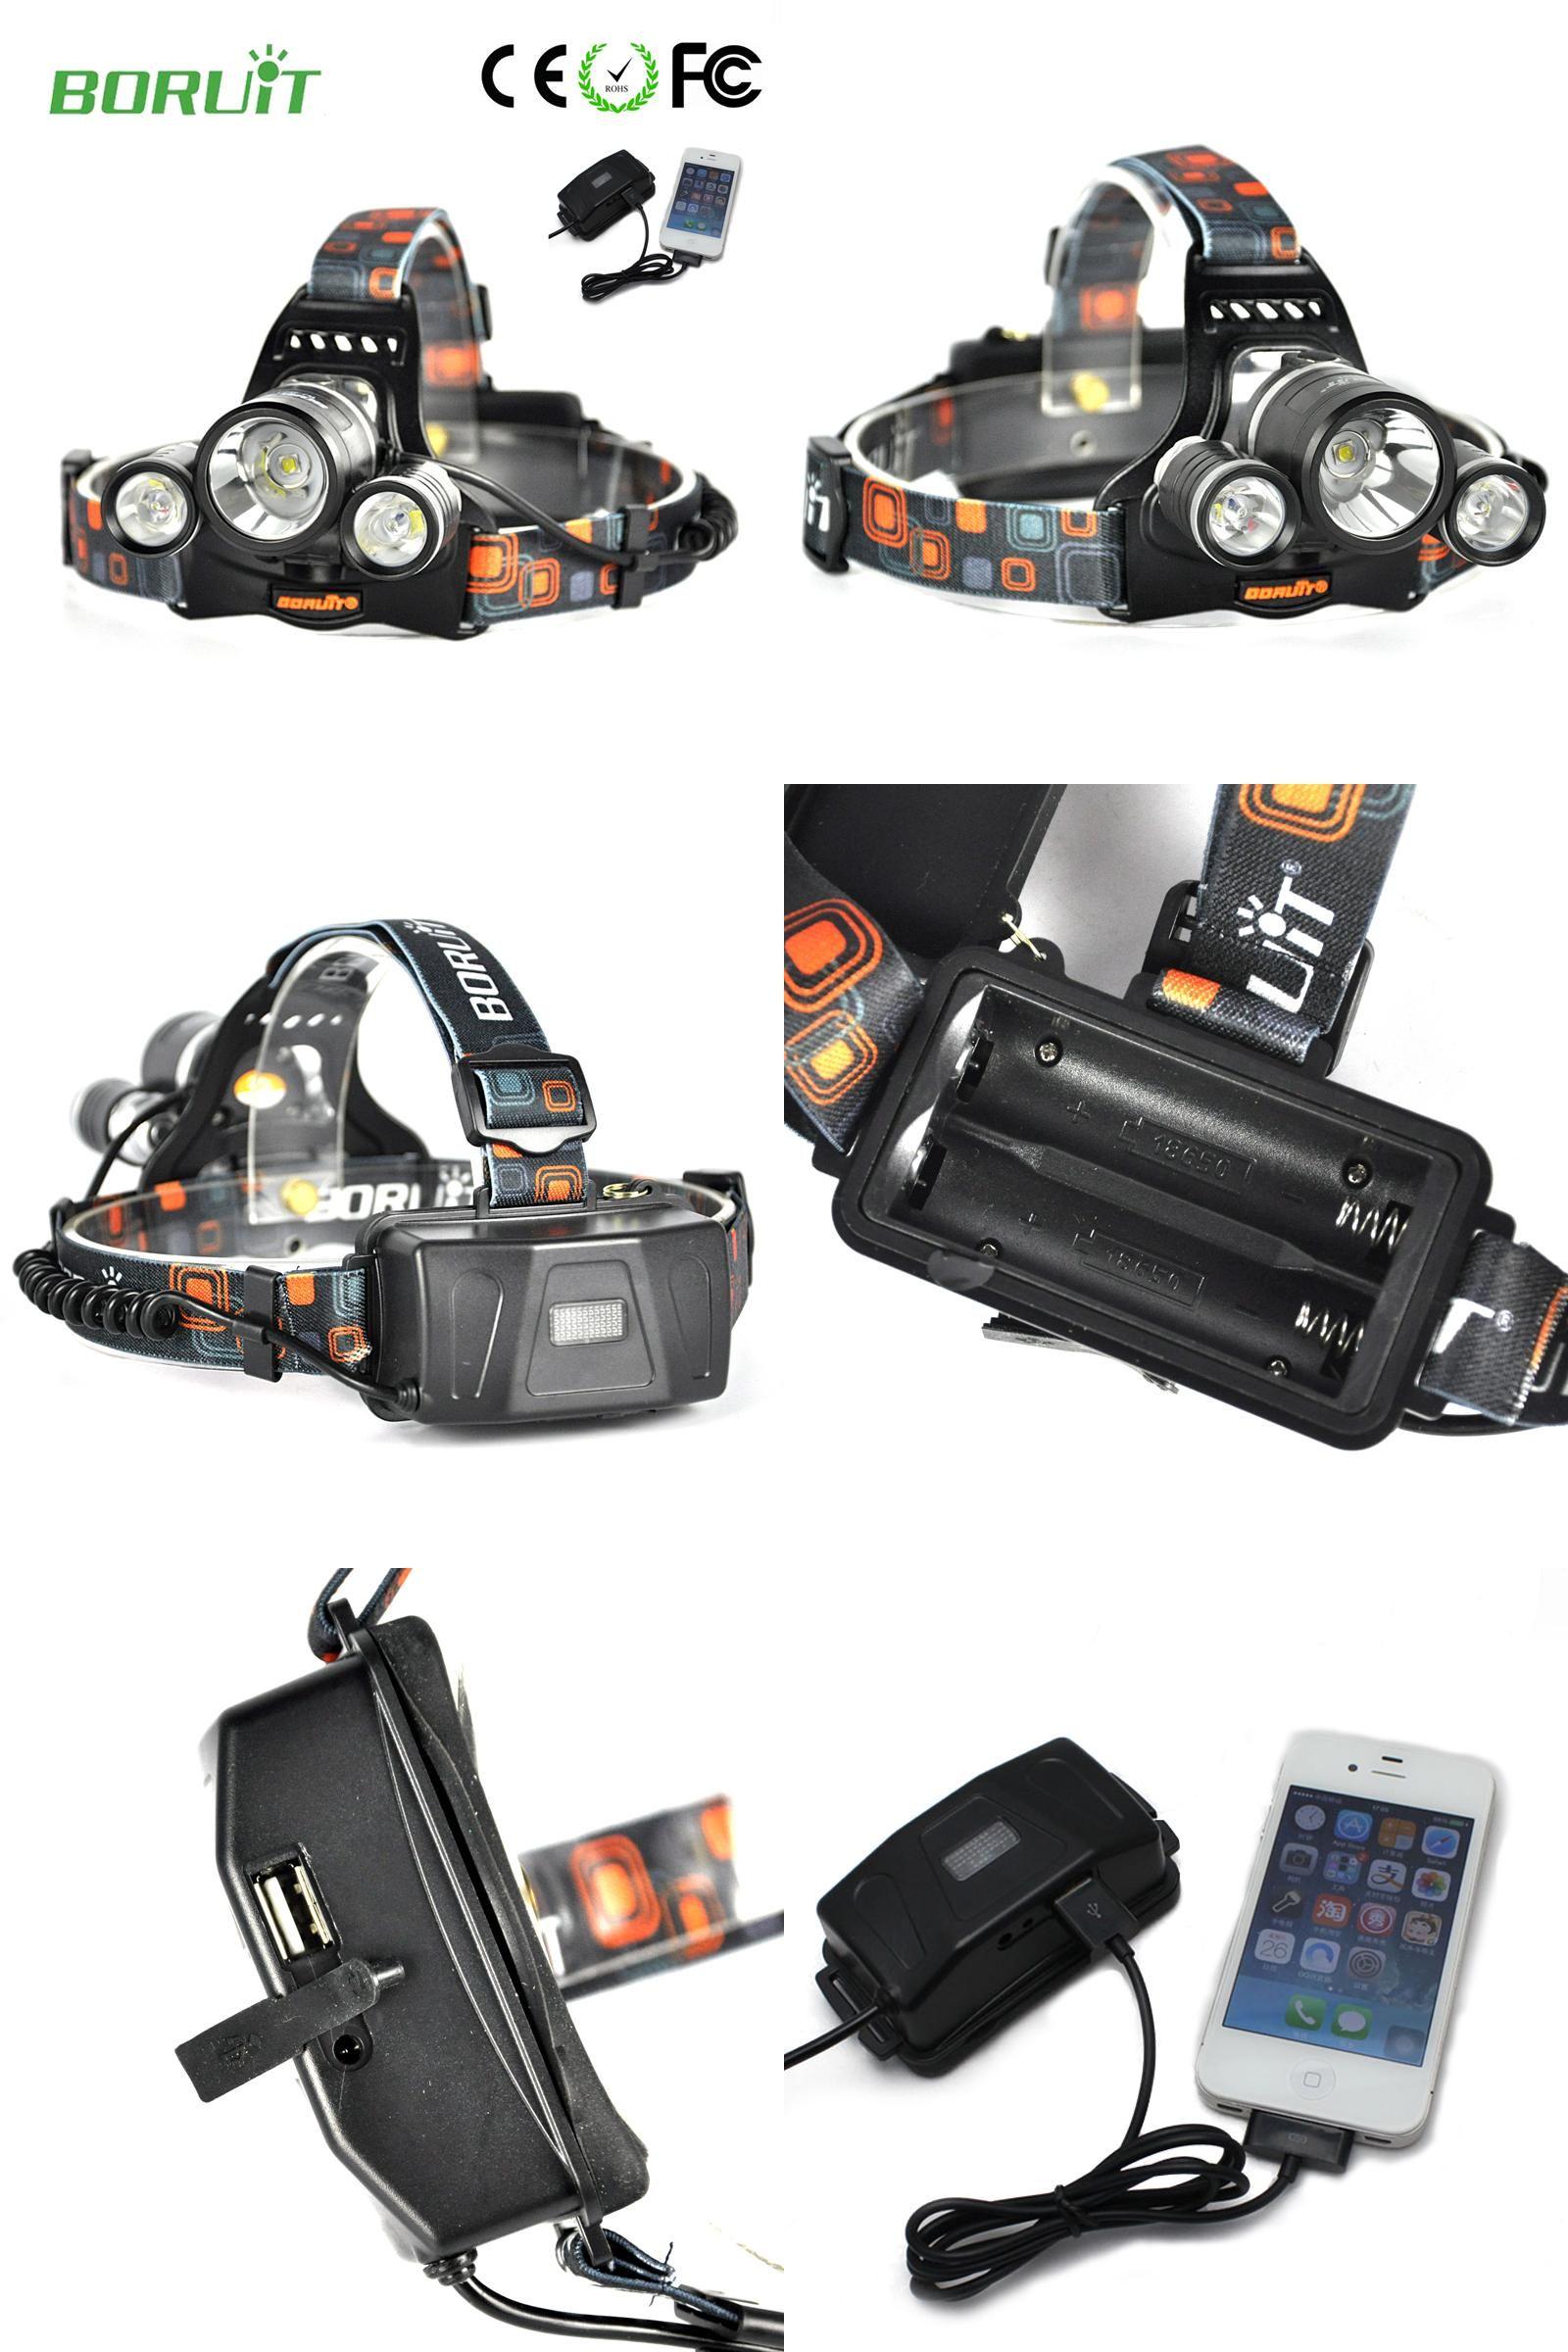 [Visit to Buy] Boruit RJ-5001 Led headlamp Headlight 6000 lumens Linterna frontal 3 XM-L2 Hiking Flashlight head Torch light lamp with charger #Advertisement